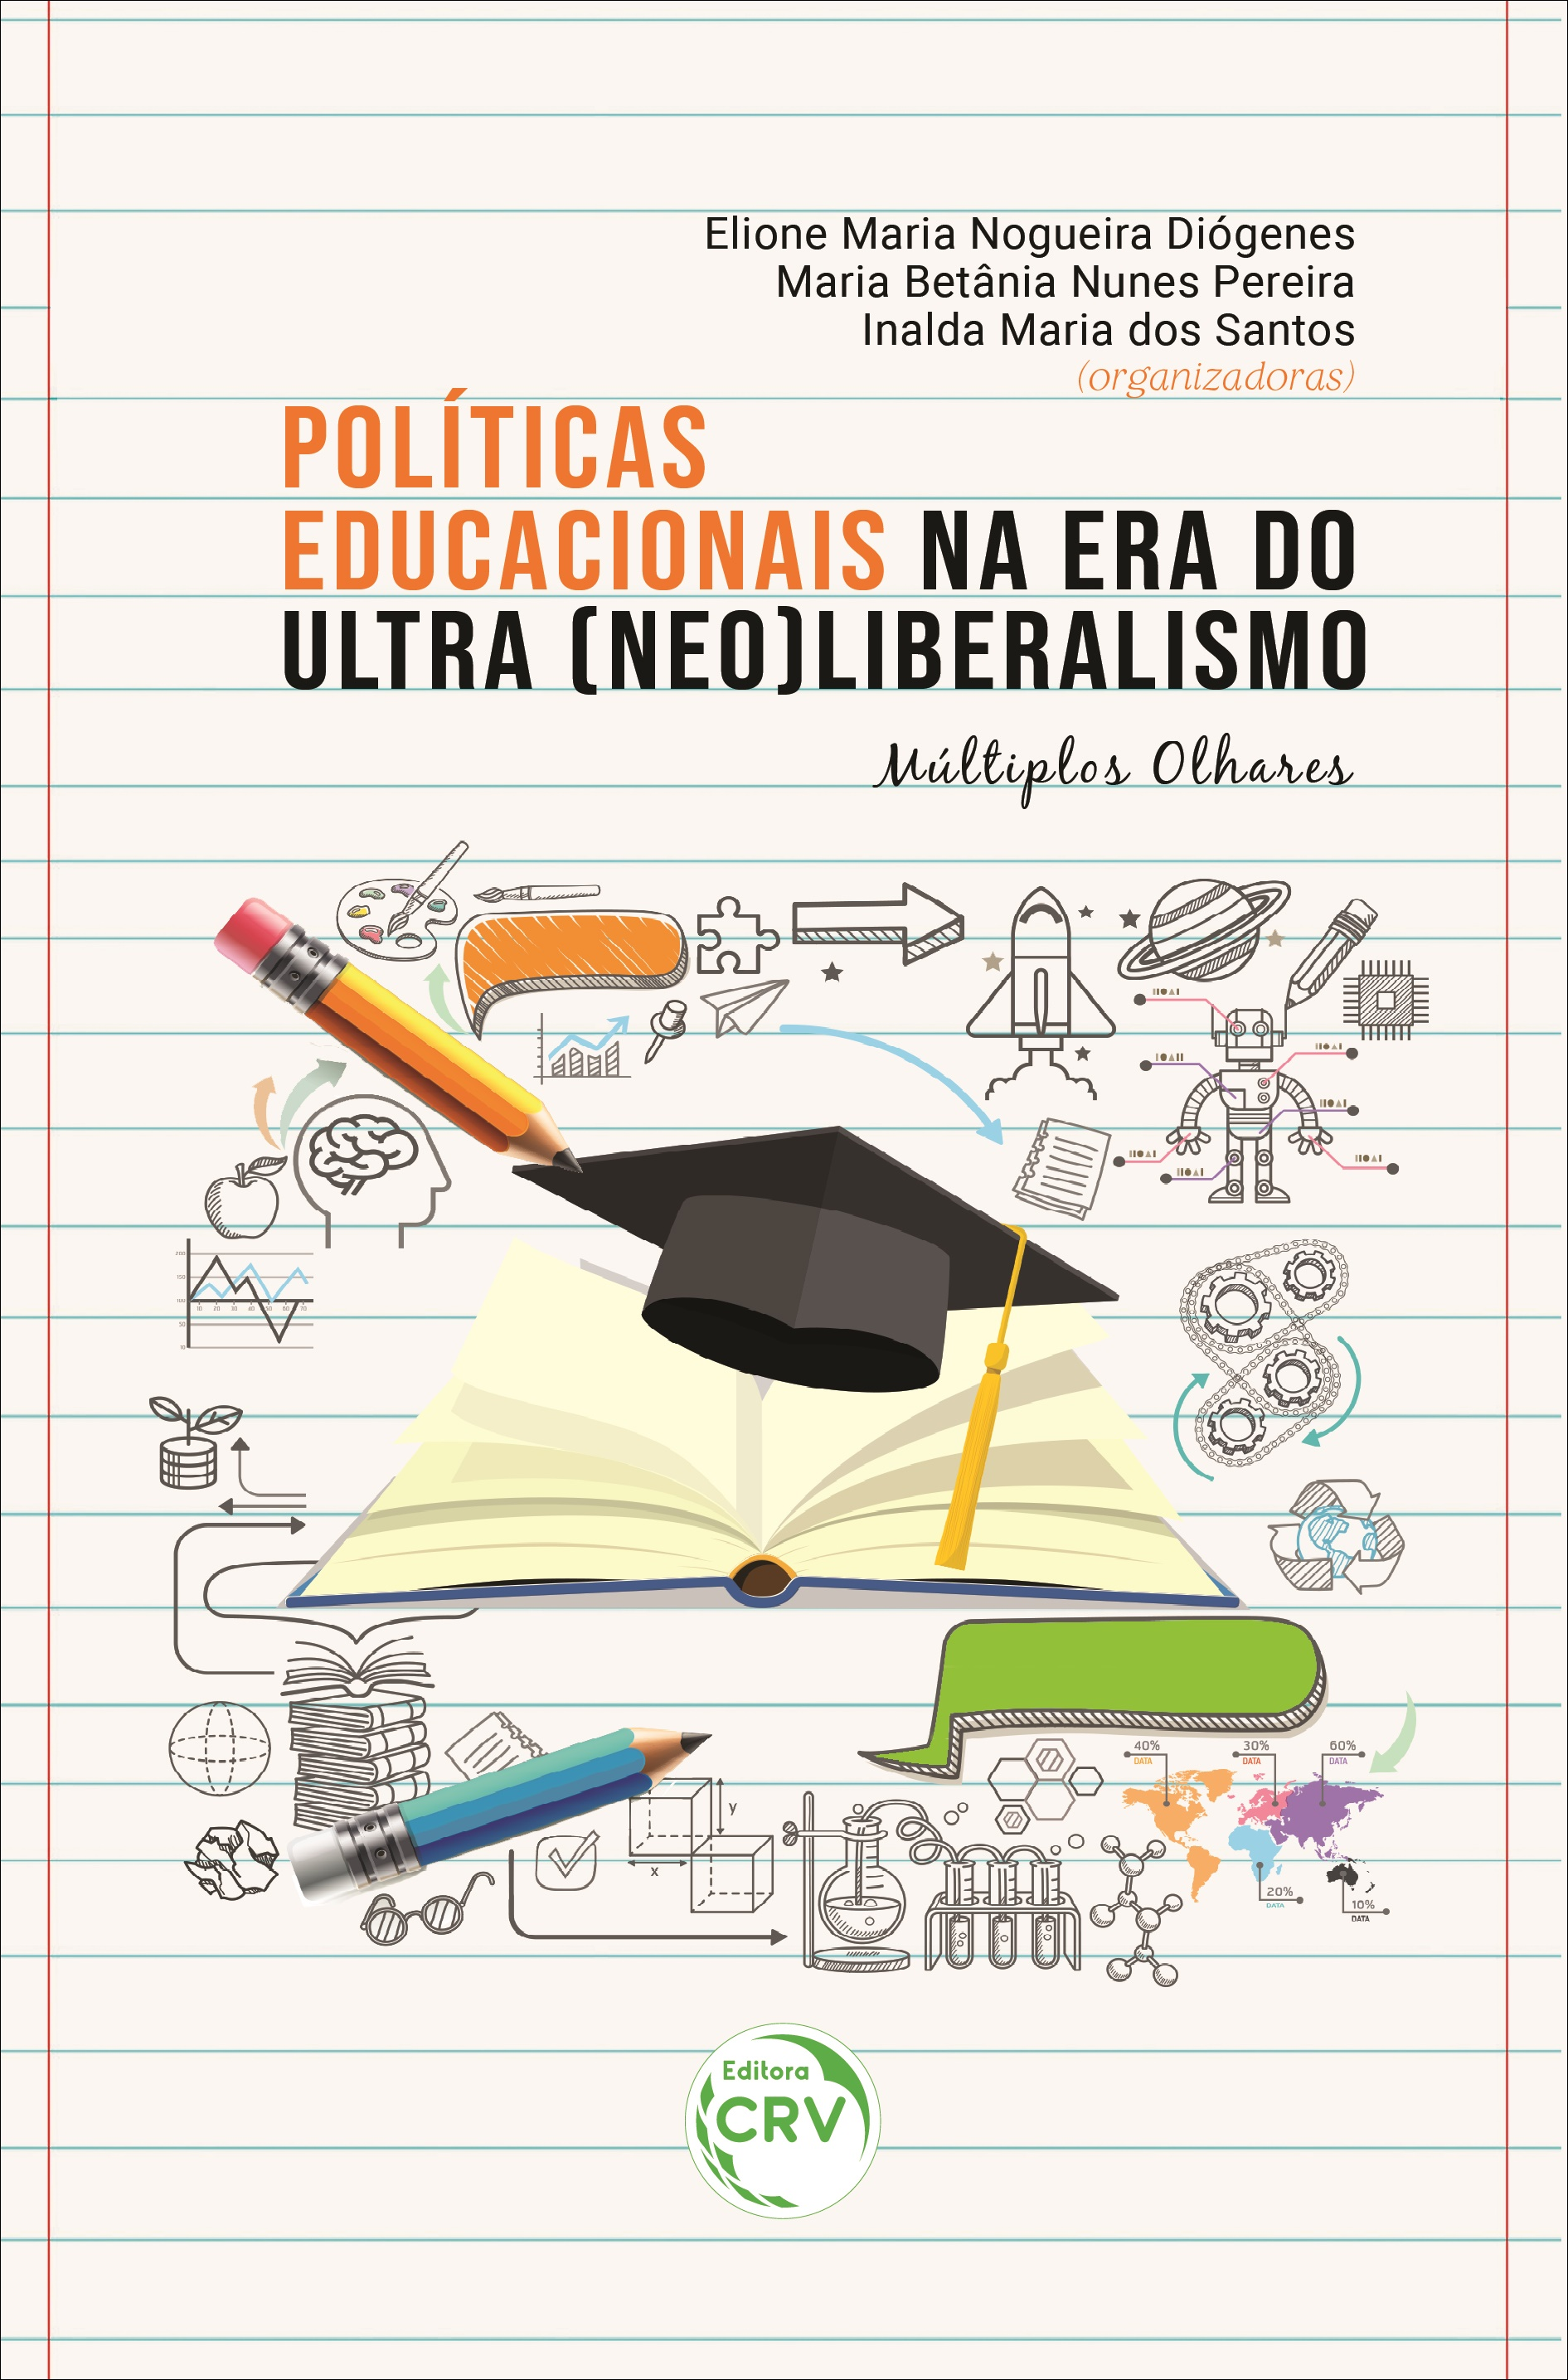 Capa do livro: POLÍTICAS EDUCACIONAIS NA ERA DO ULTRA (NEO) LIBERALISMO:<br> múltiplos olhares